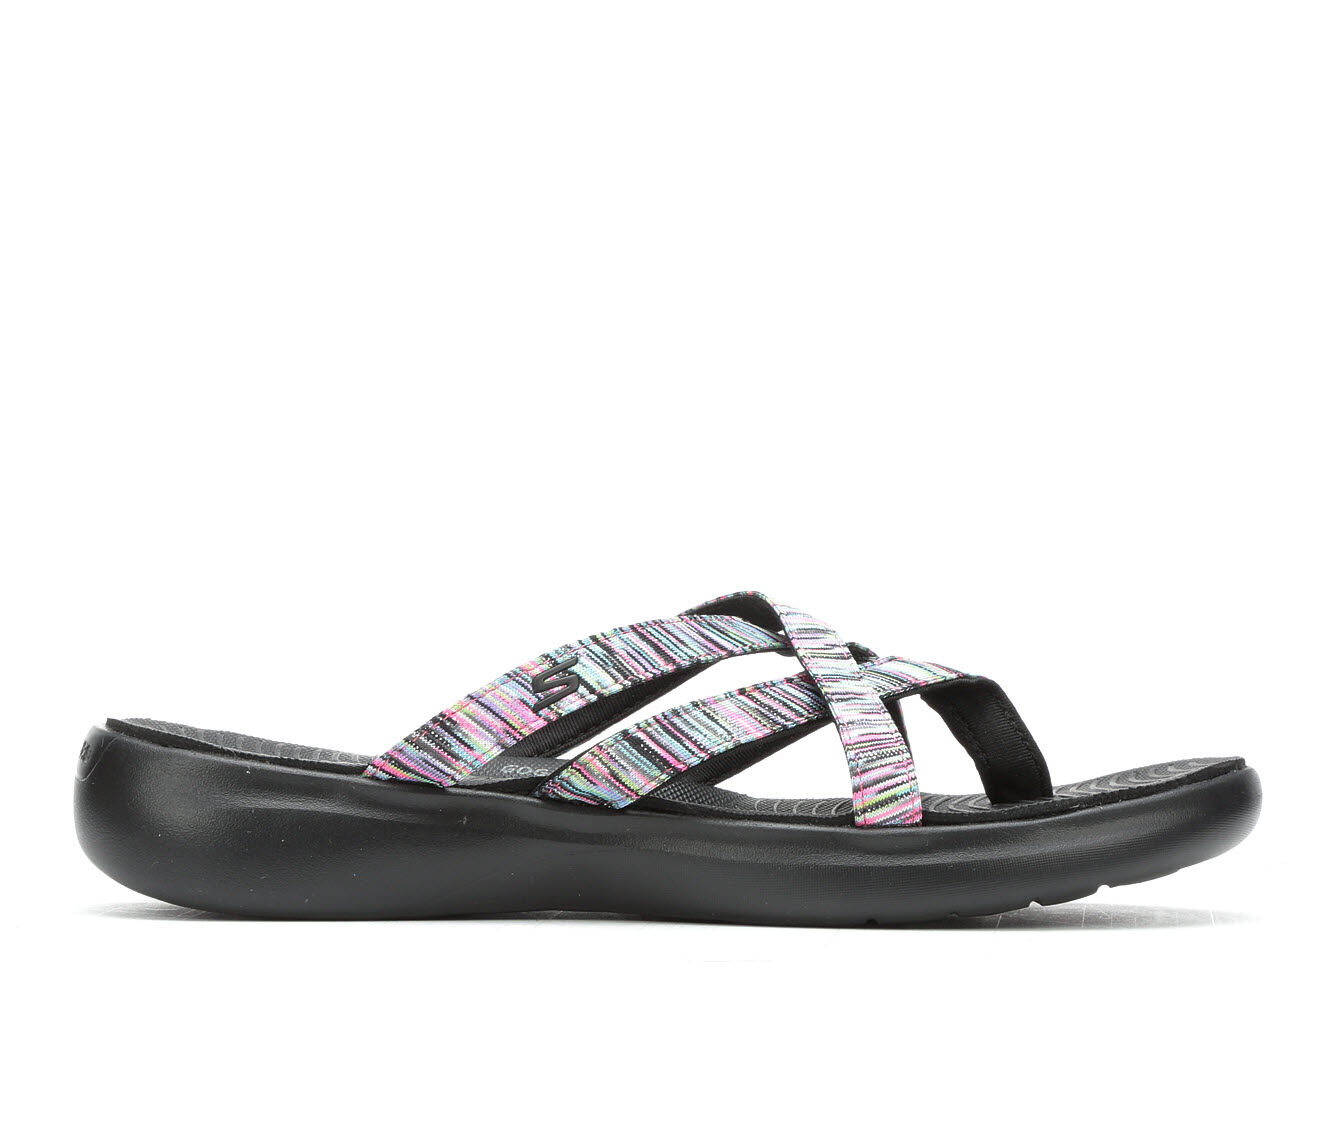 new arrivals Women's Skechers Go Go Luxe 16282 Sandals Black Multi